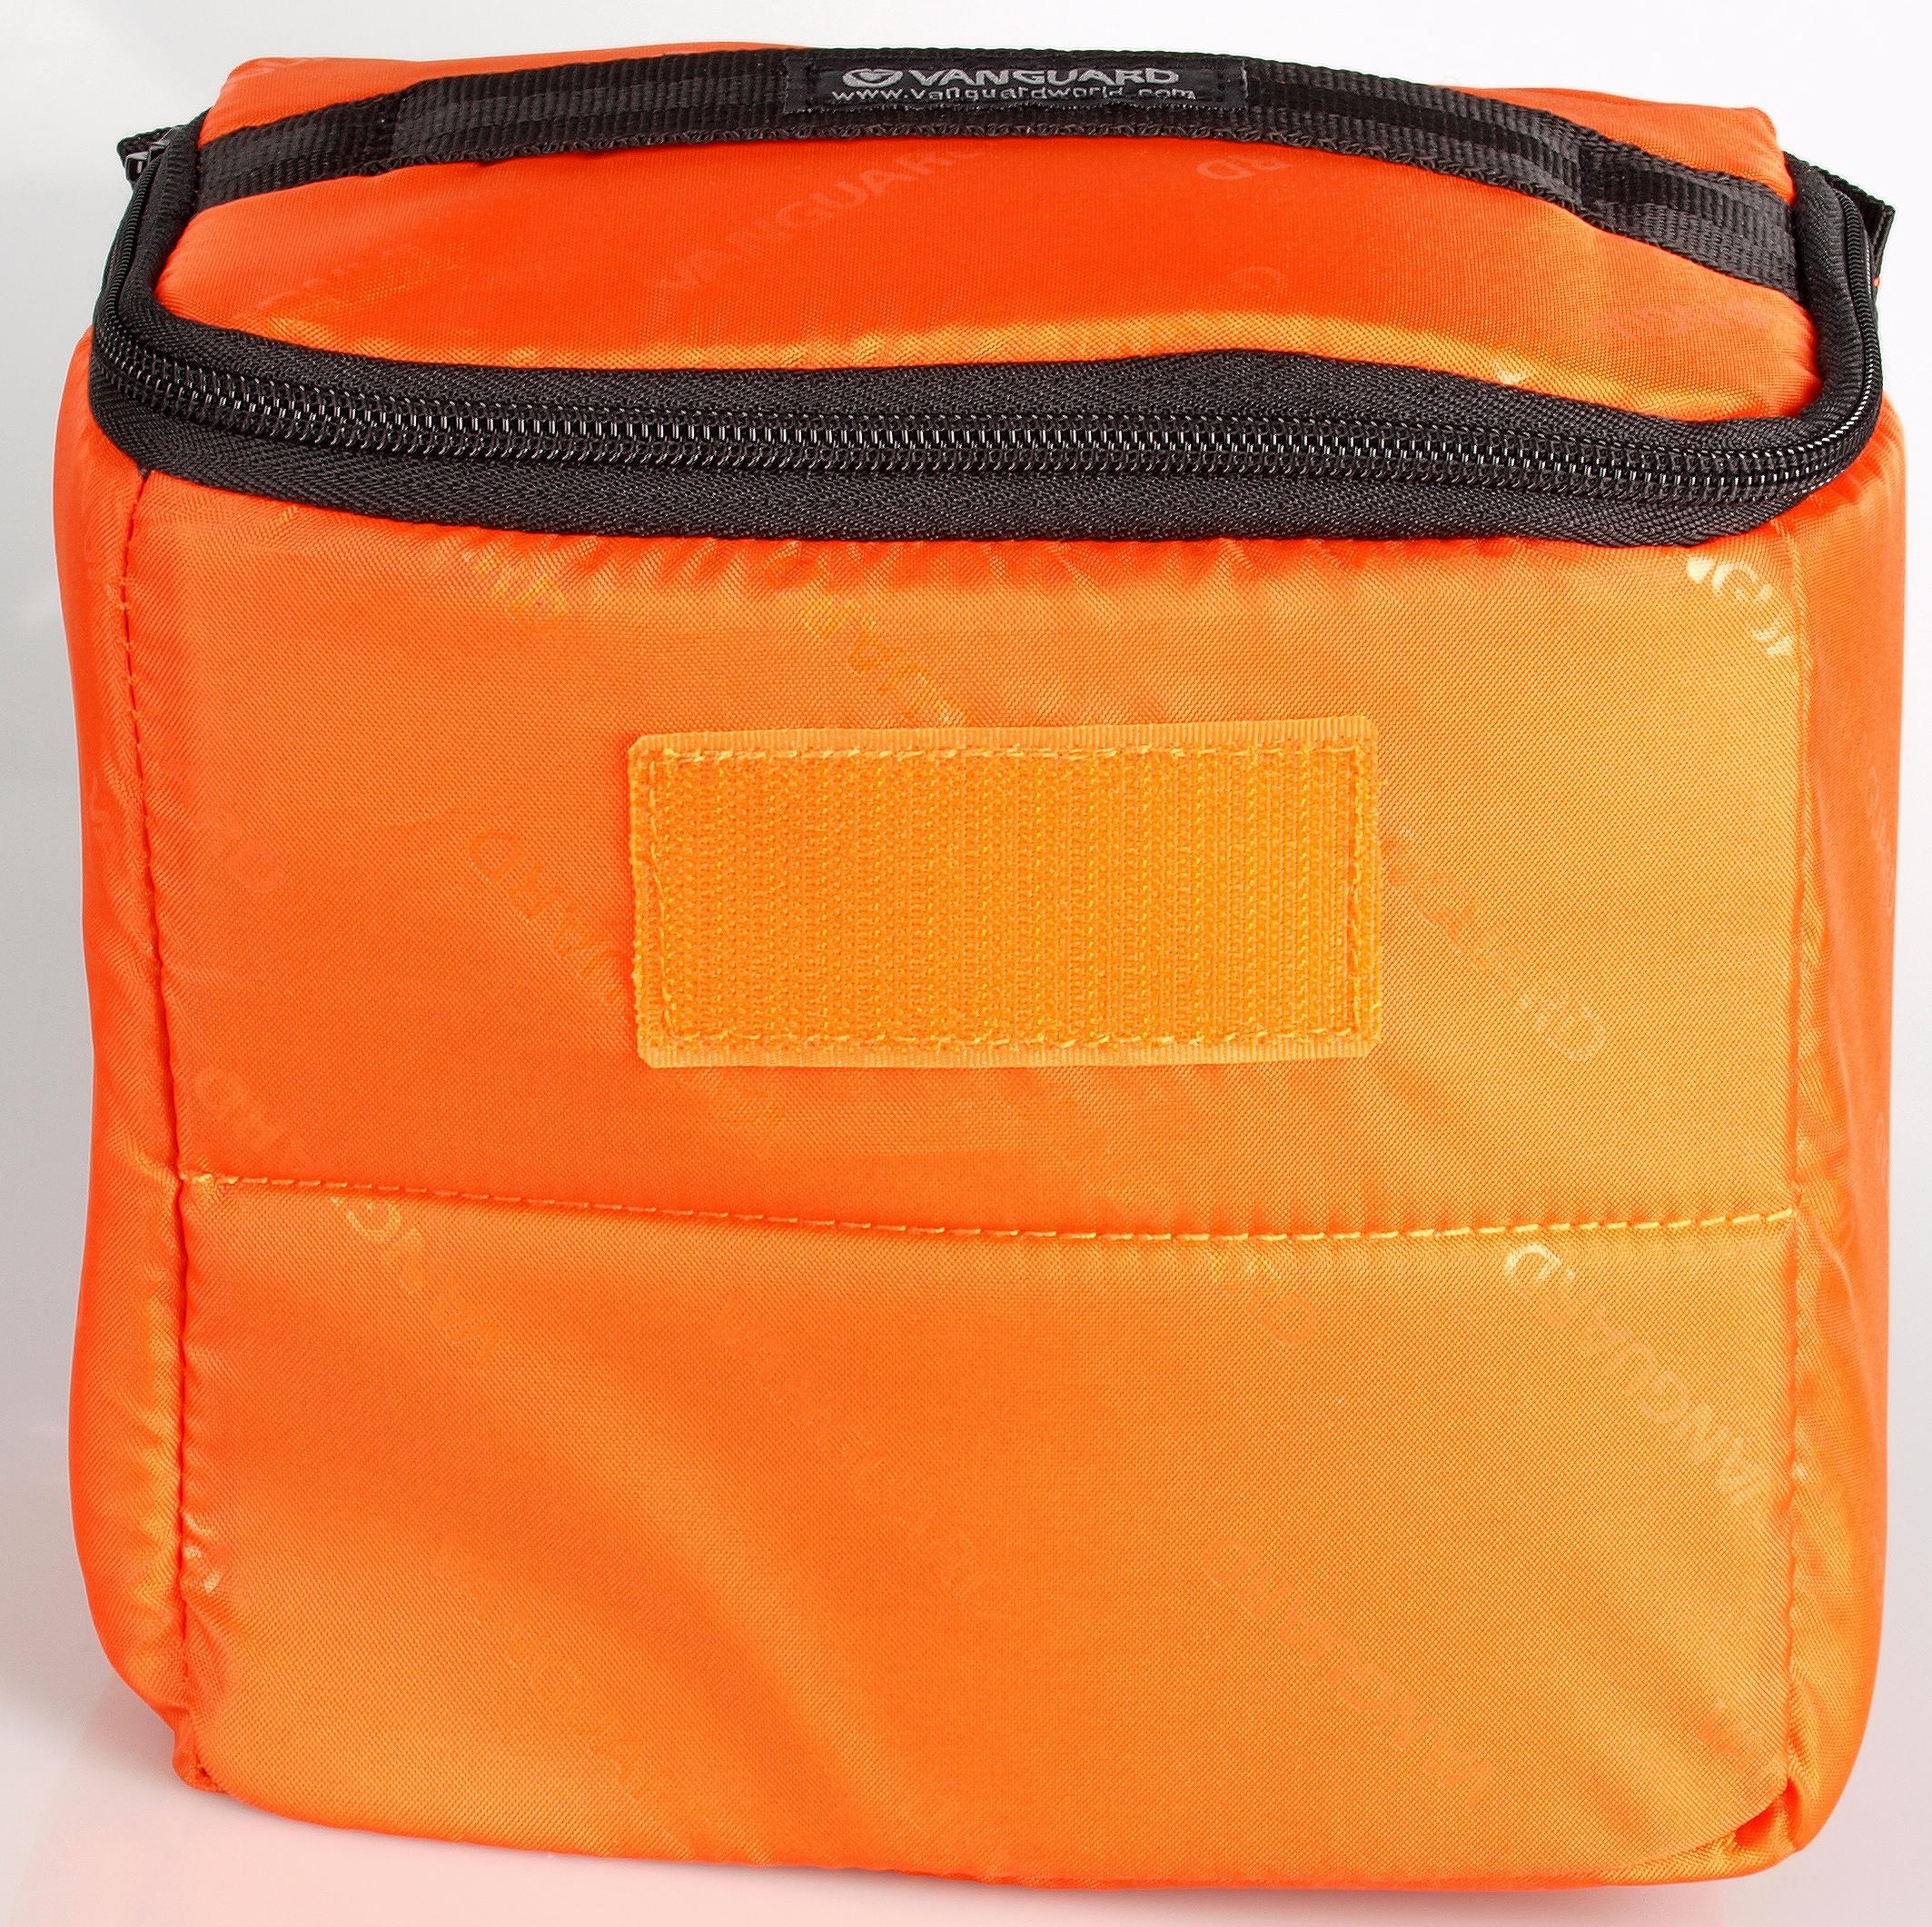 Vanguard Vojo 22 Bag Review 13 9